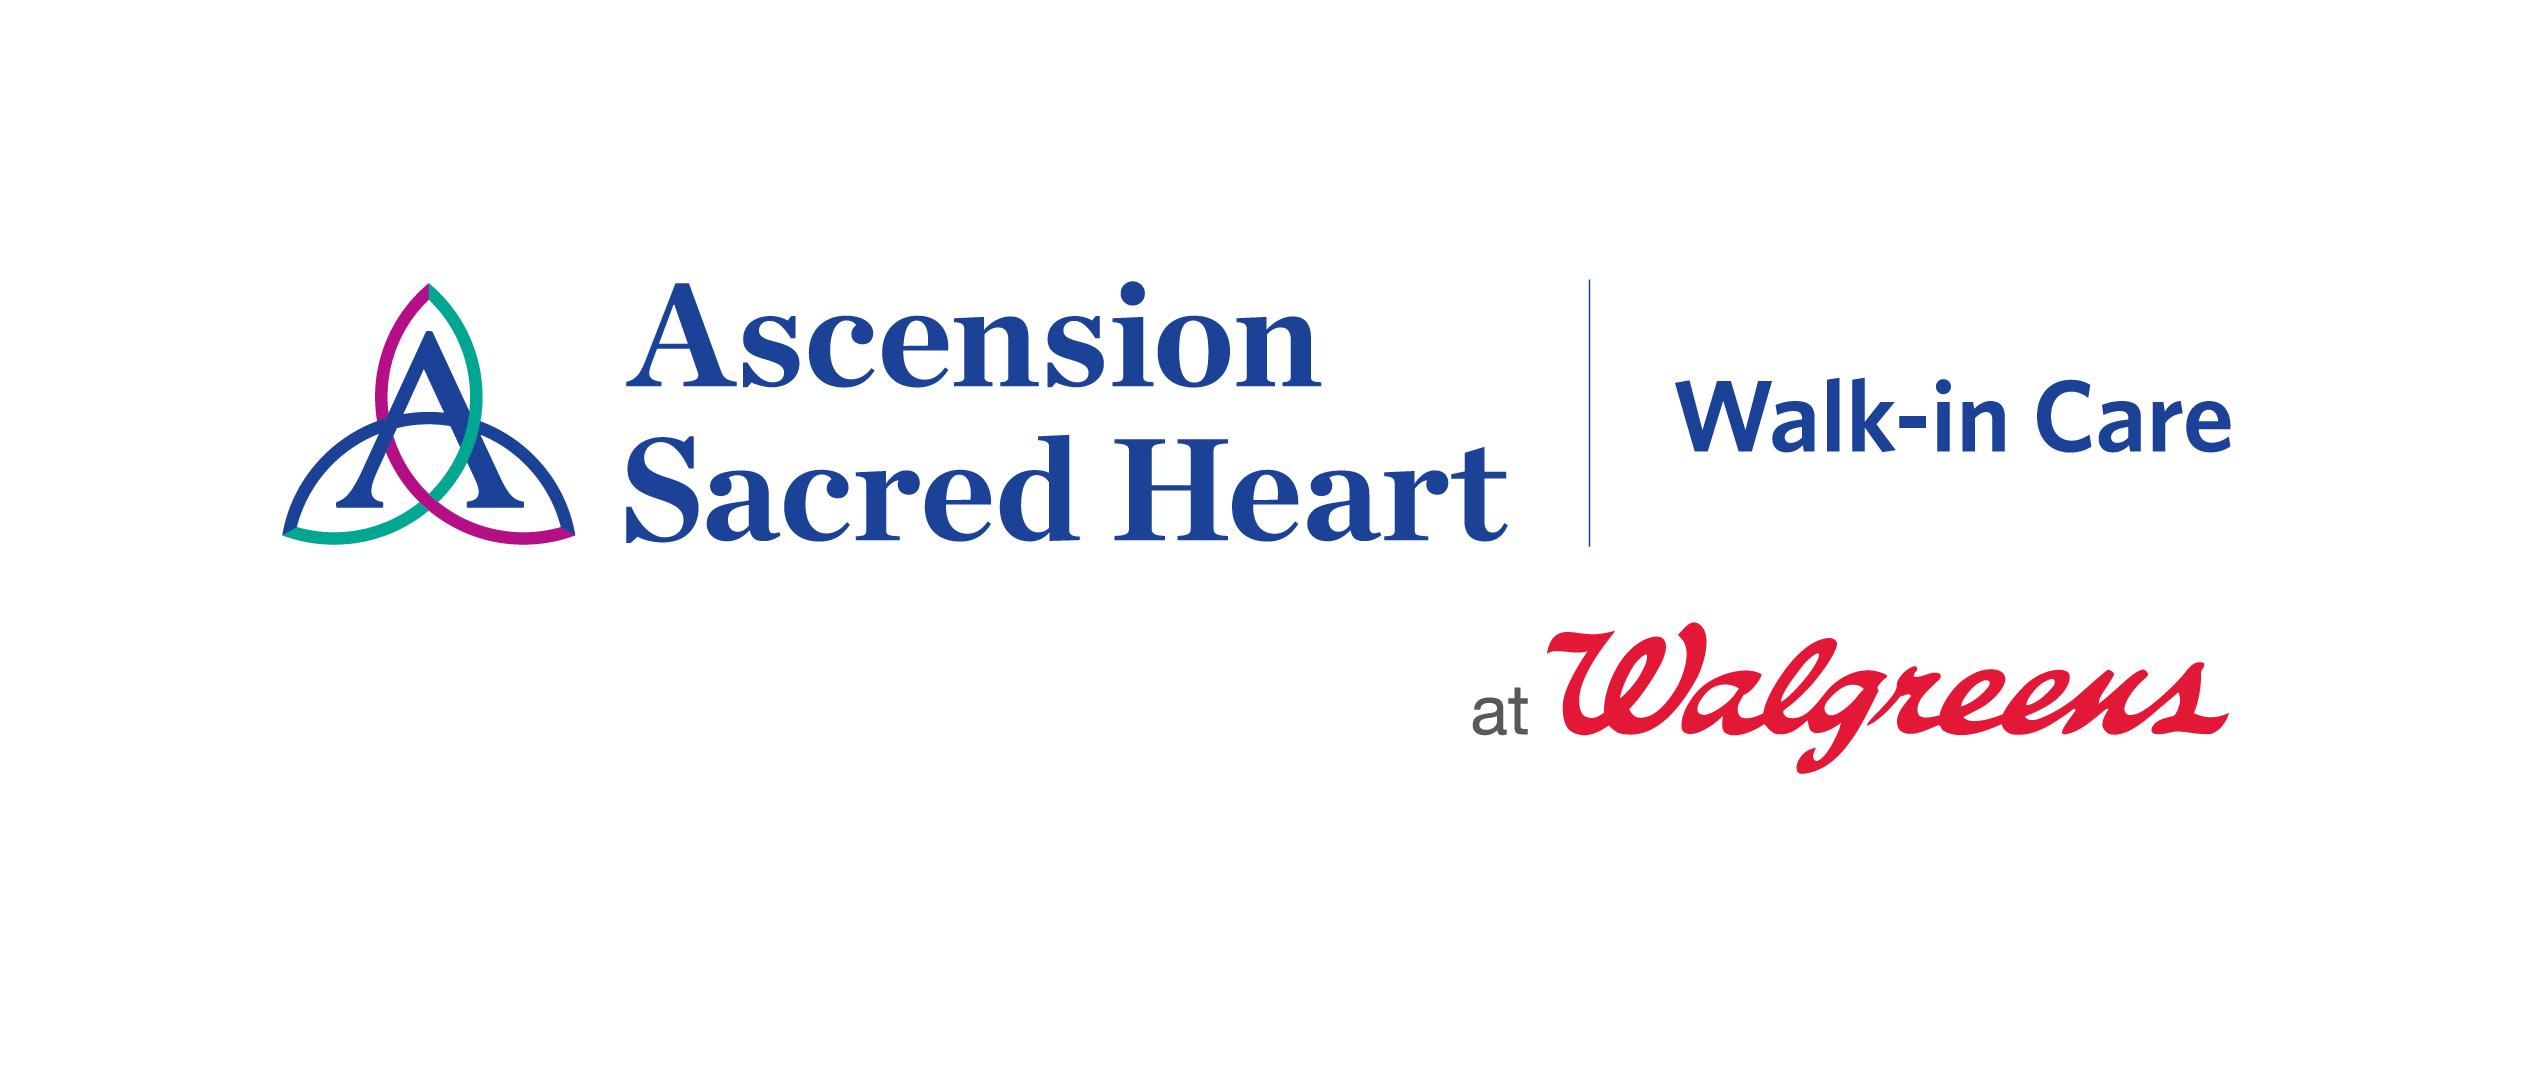 Asc sacred heart walgreens hz2 fc rgb